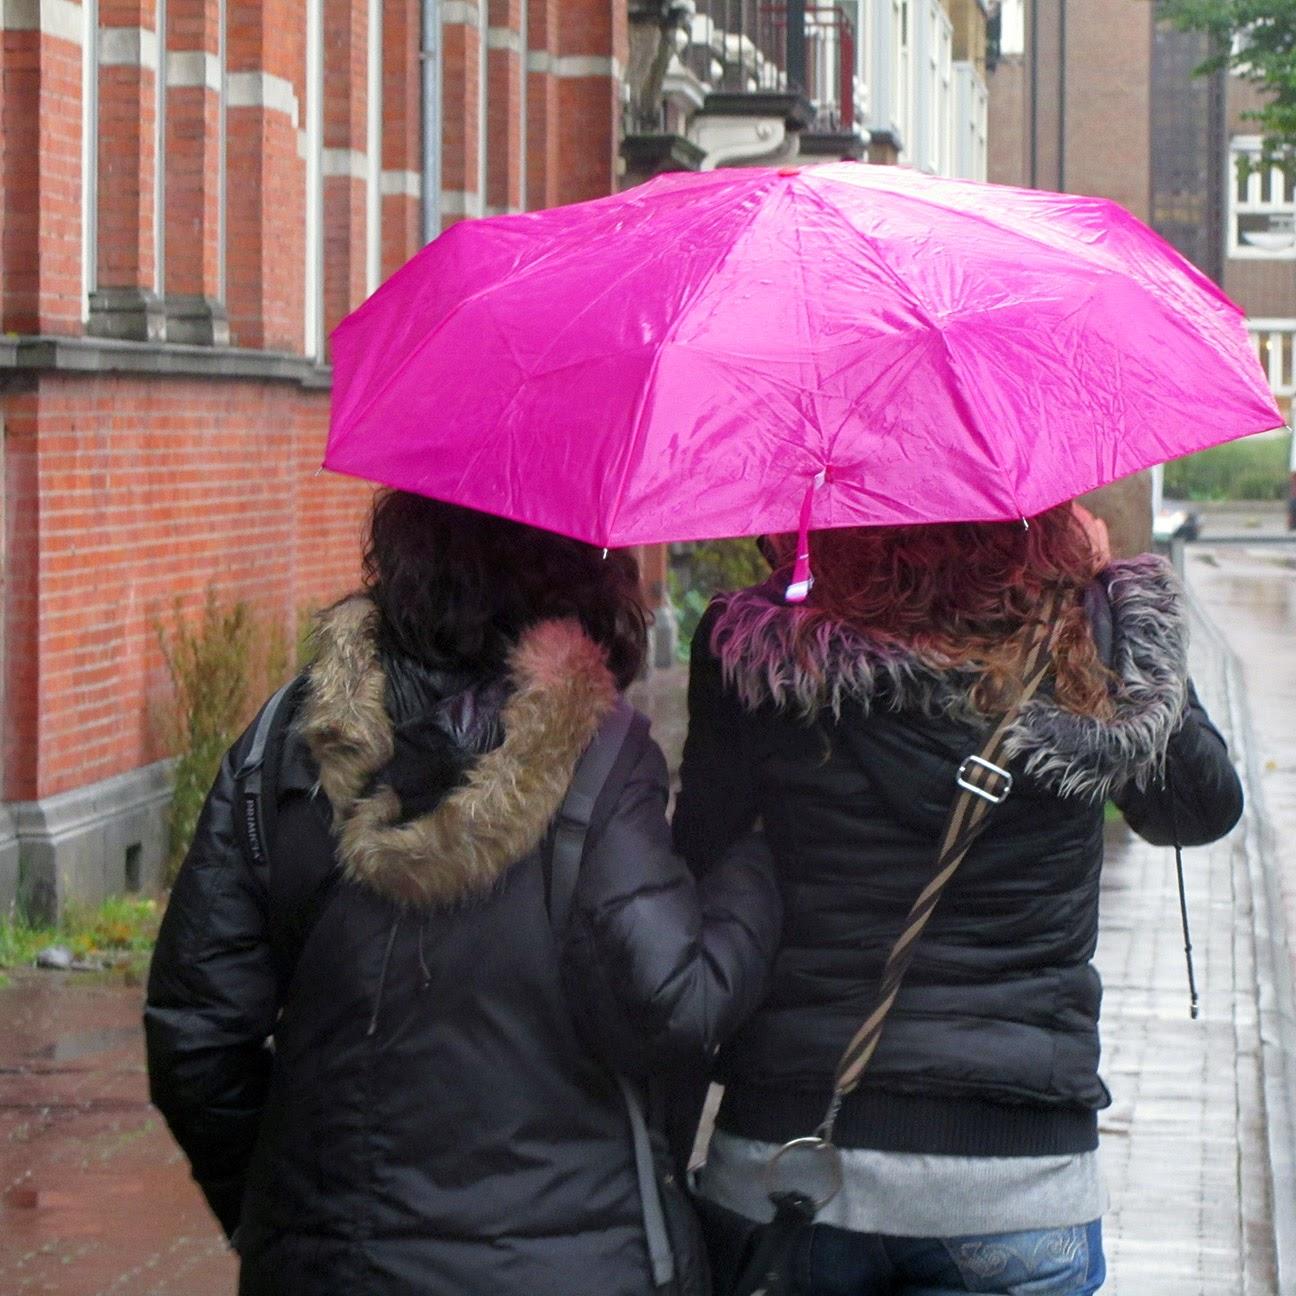 two girls under a pink umbrella